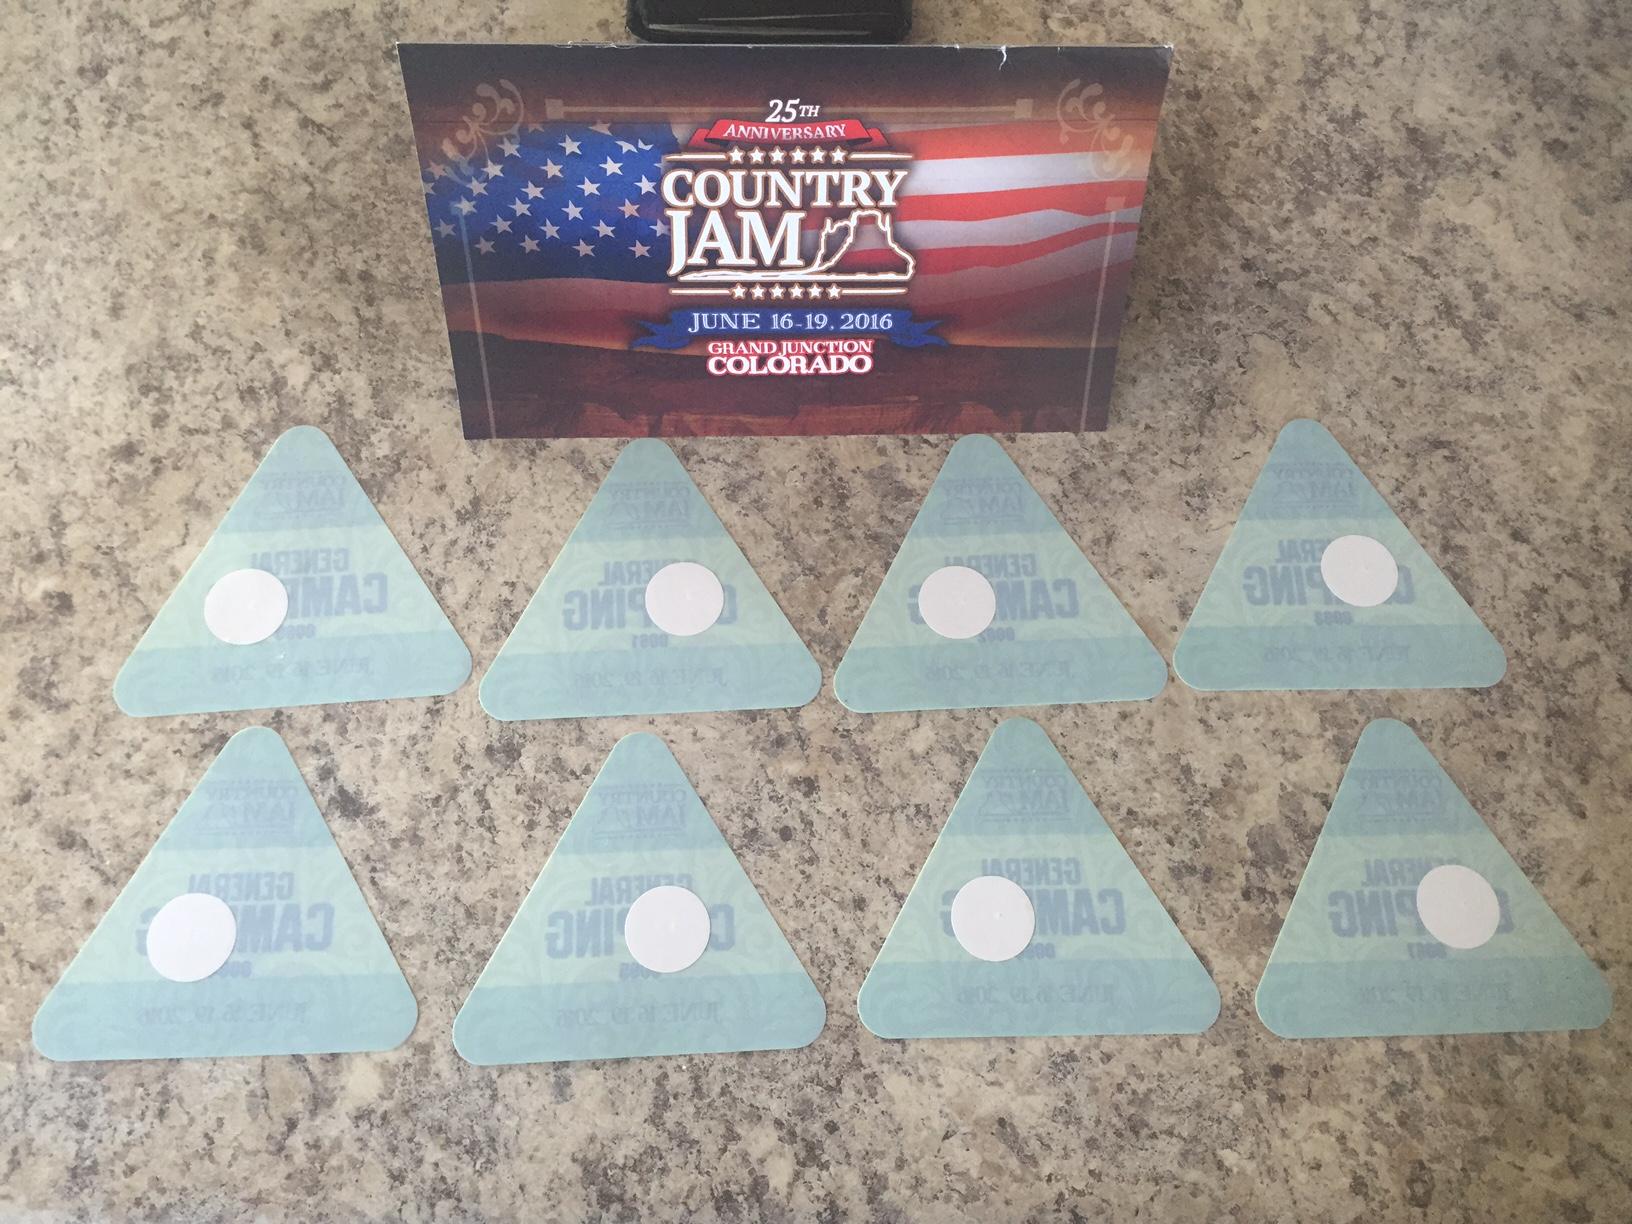 Country Jam 2016